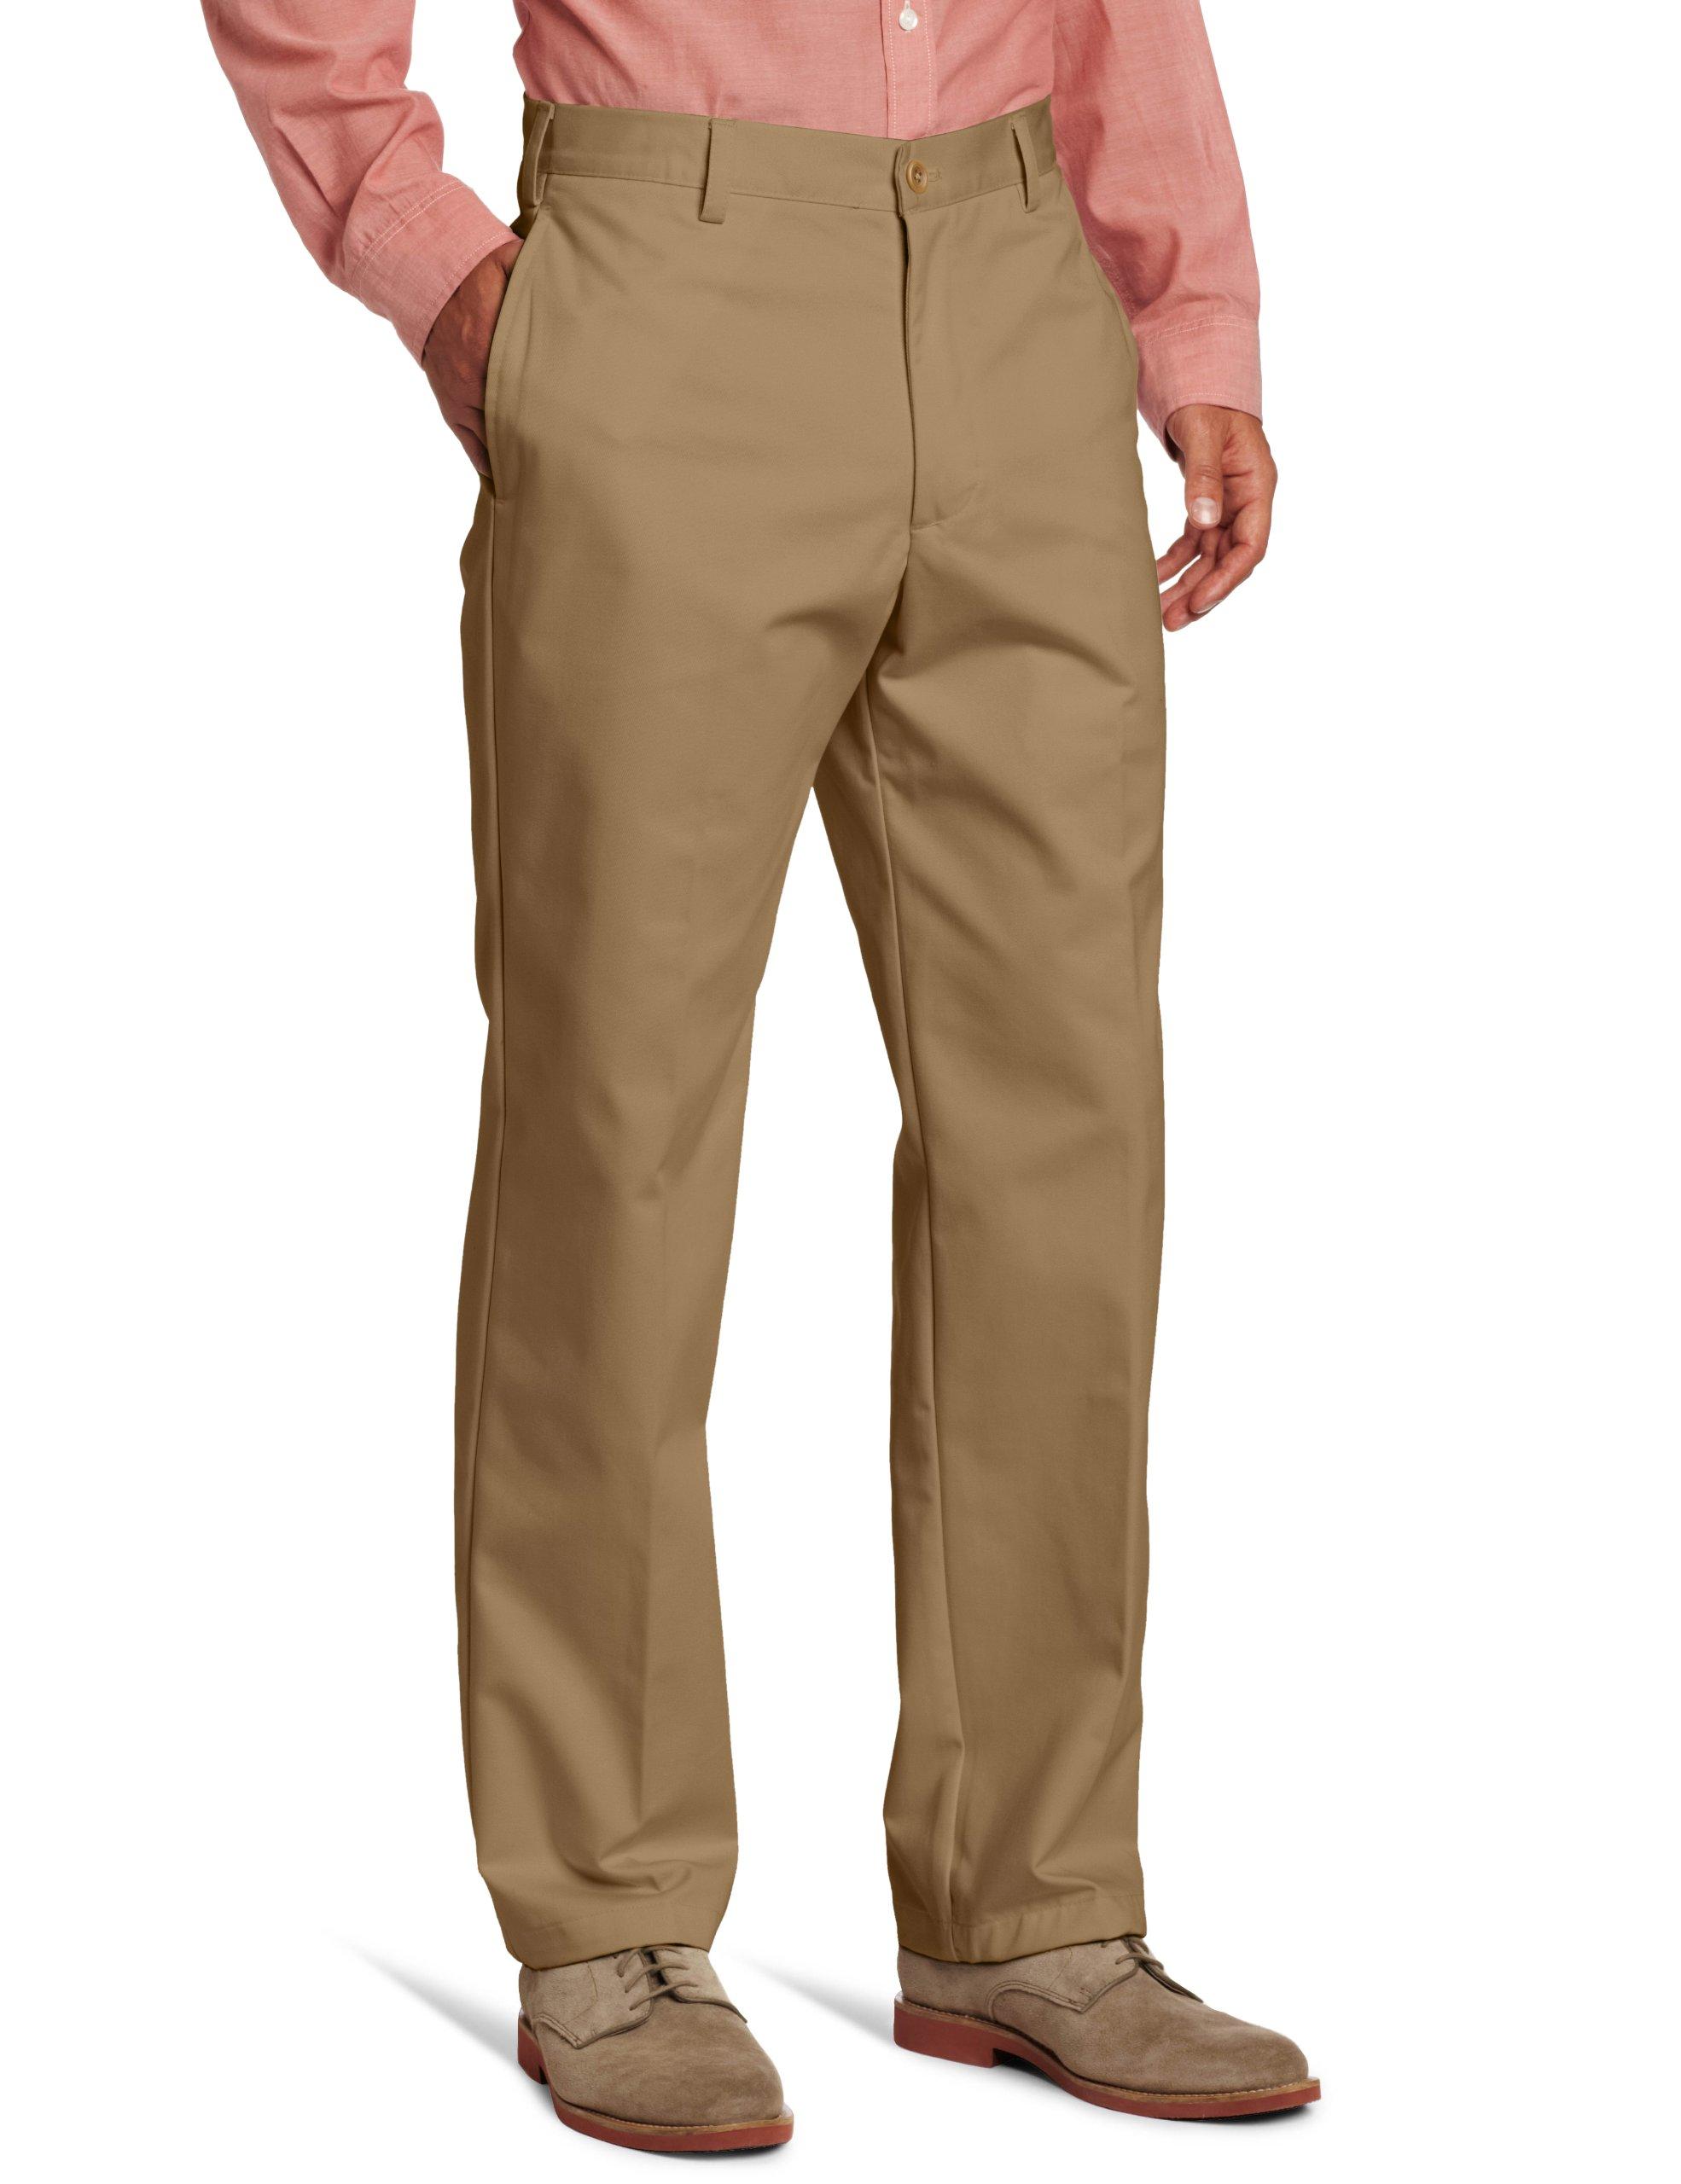 IZOD Men's American Chino Flat Front Pant, English Khaki, 36W x 32L